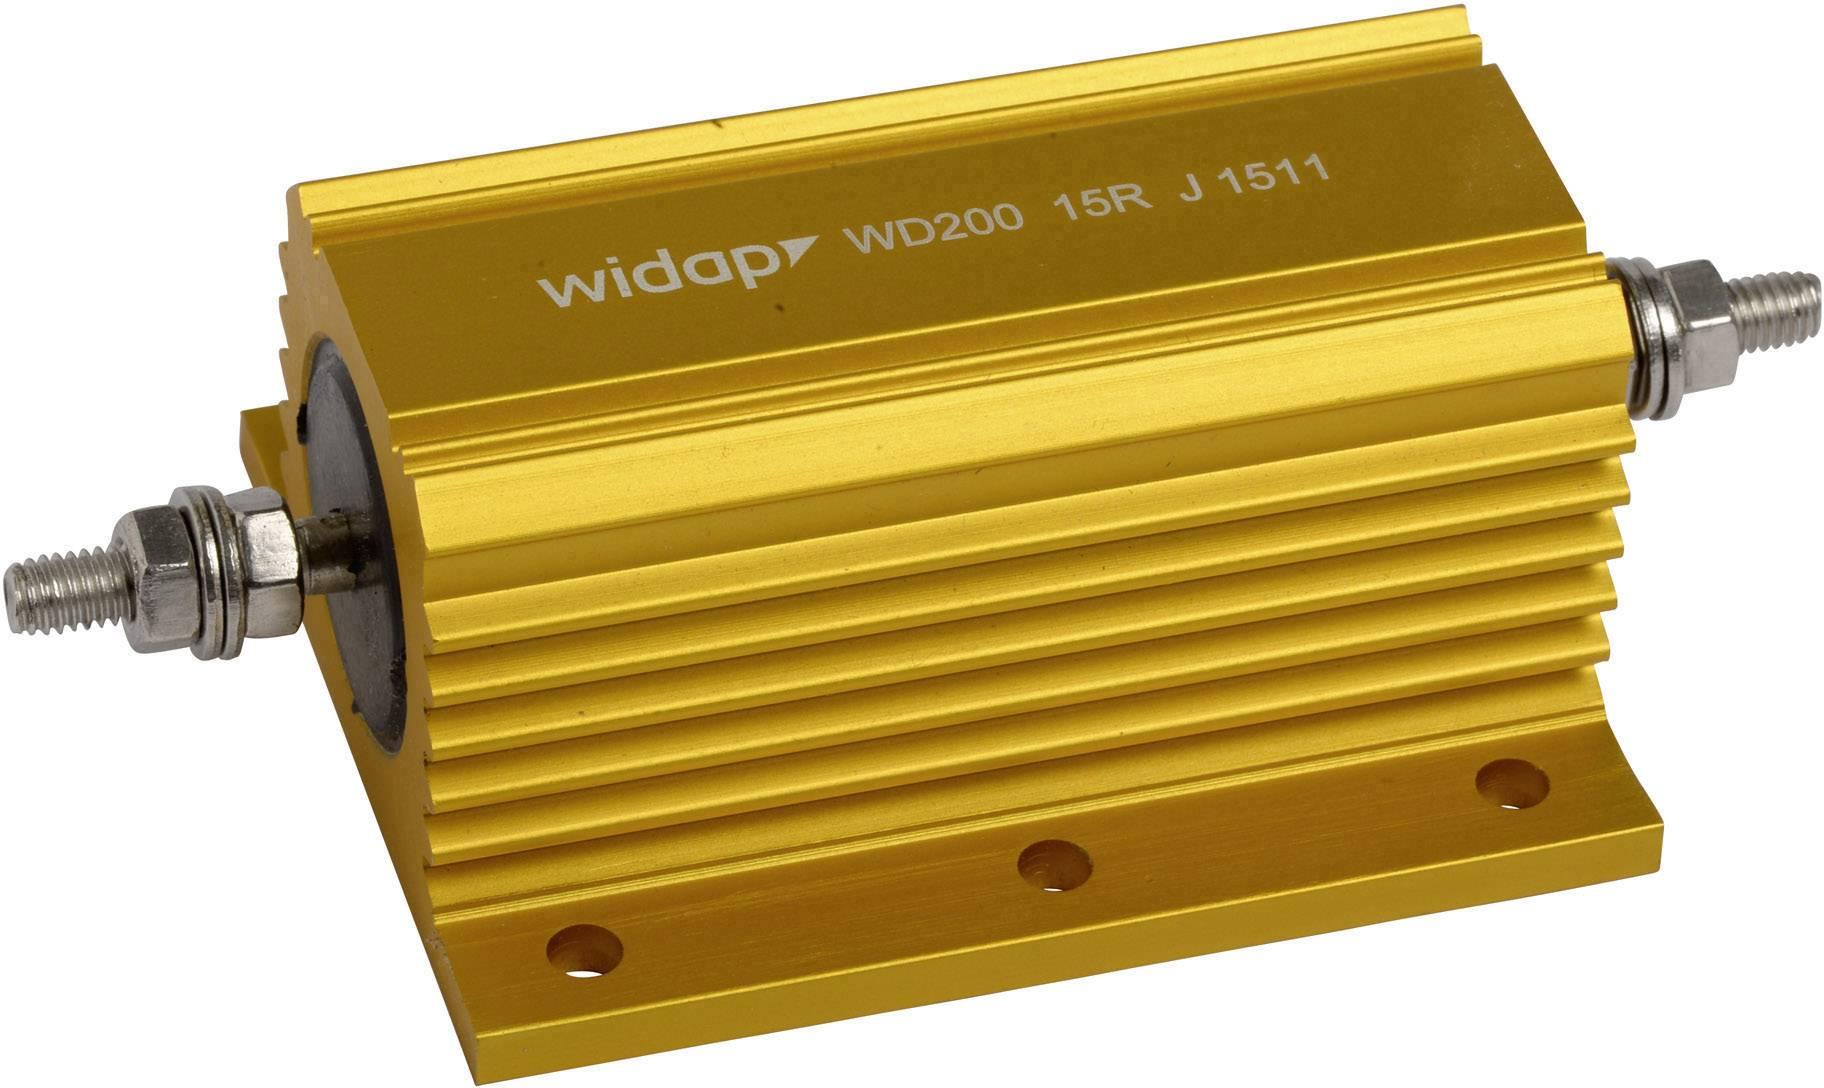 Drôtový rezistor Widap 160175, hodnota odporu 22 Ohm, 300 W, 1 ks